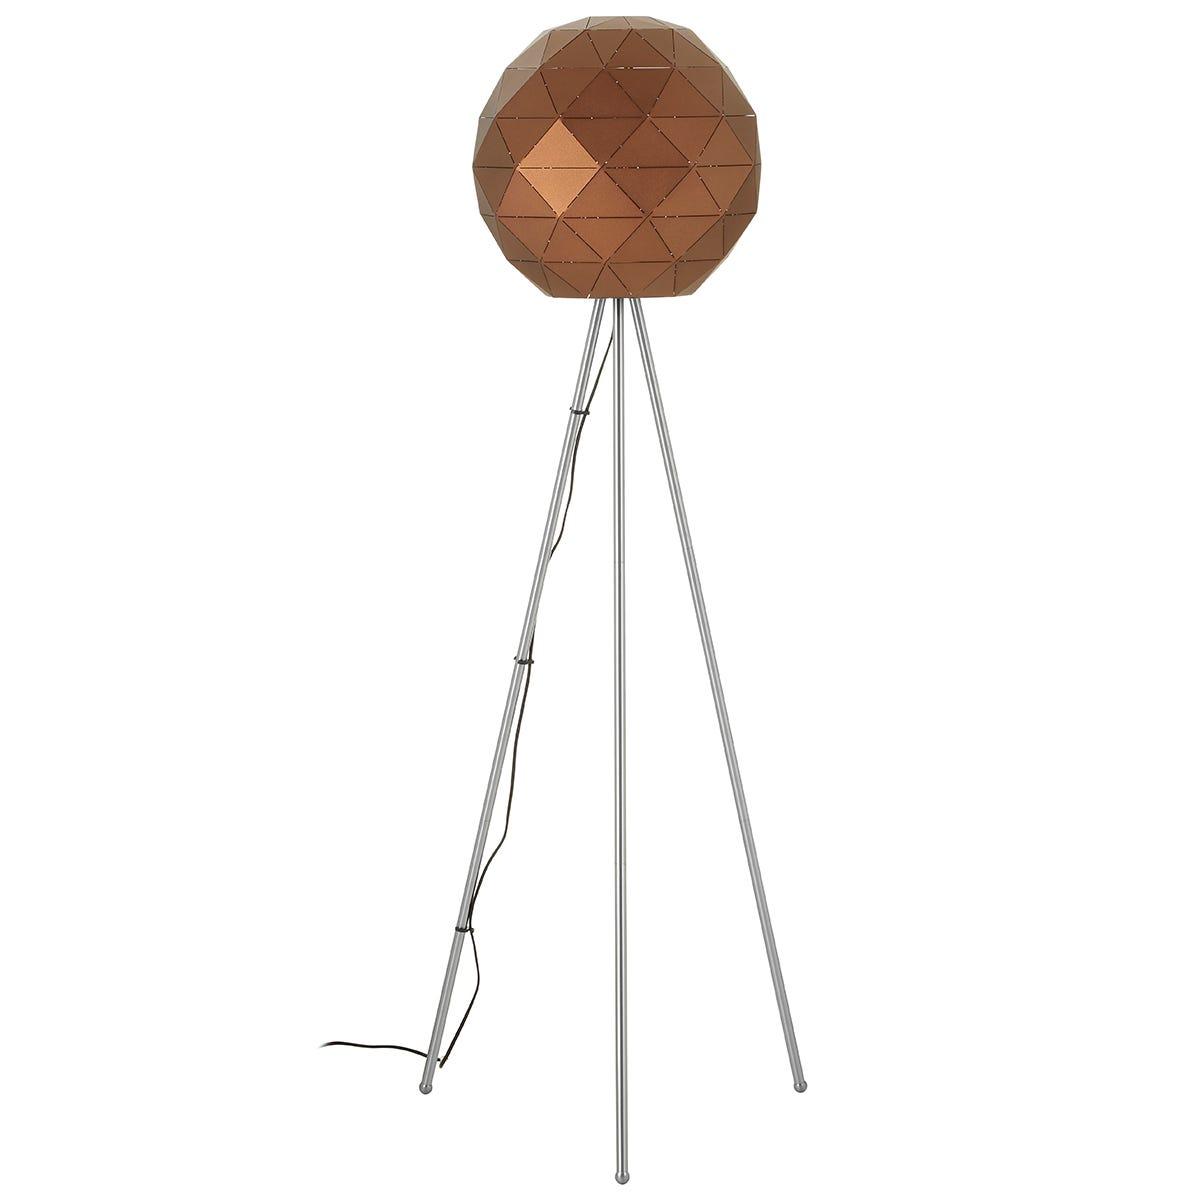 Premier Housewares Mateo Geometric Floor Lamp With Steel Base - Coffee